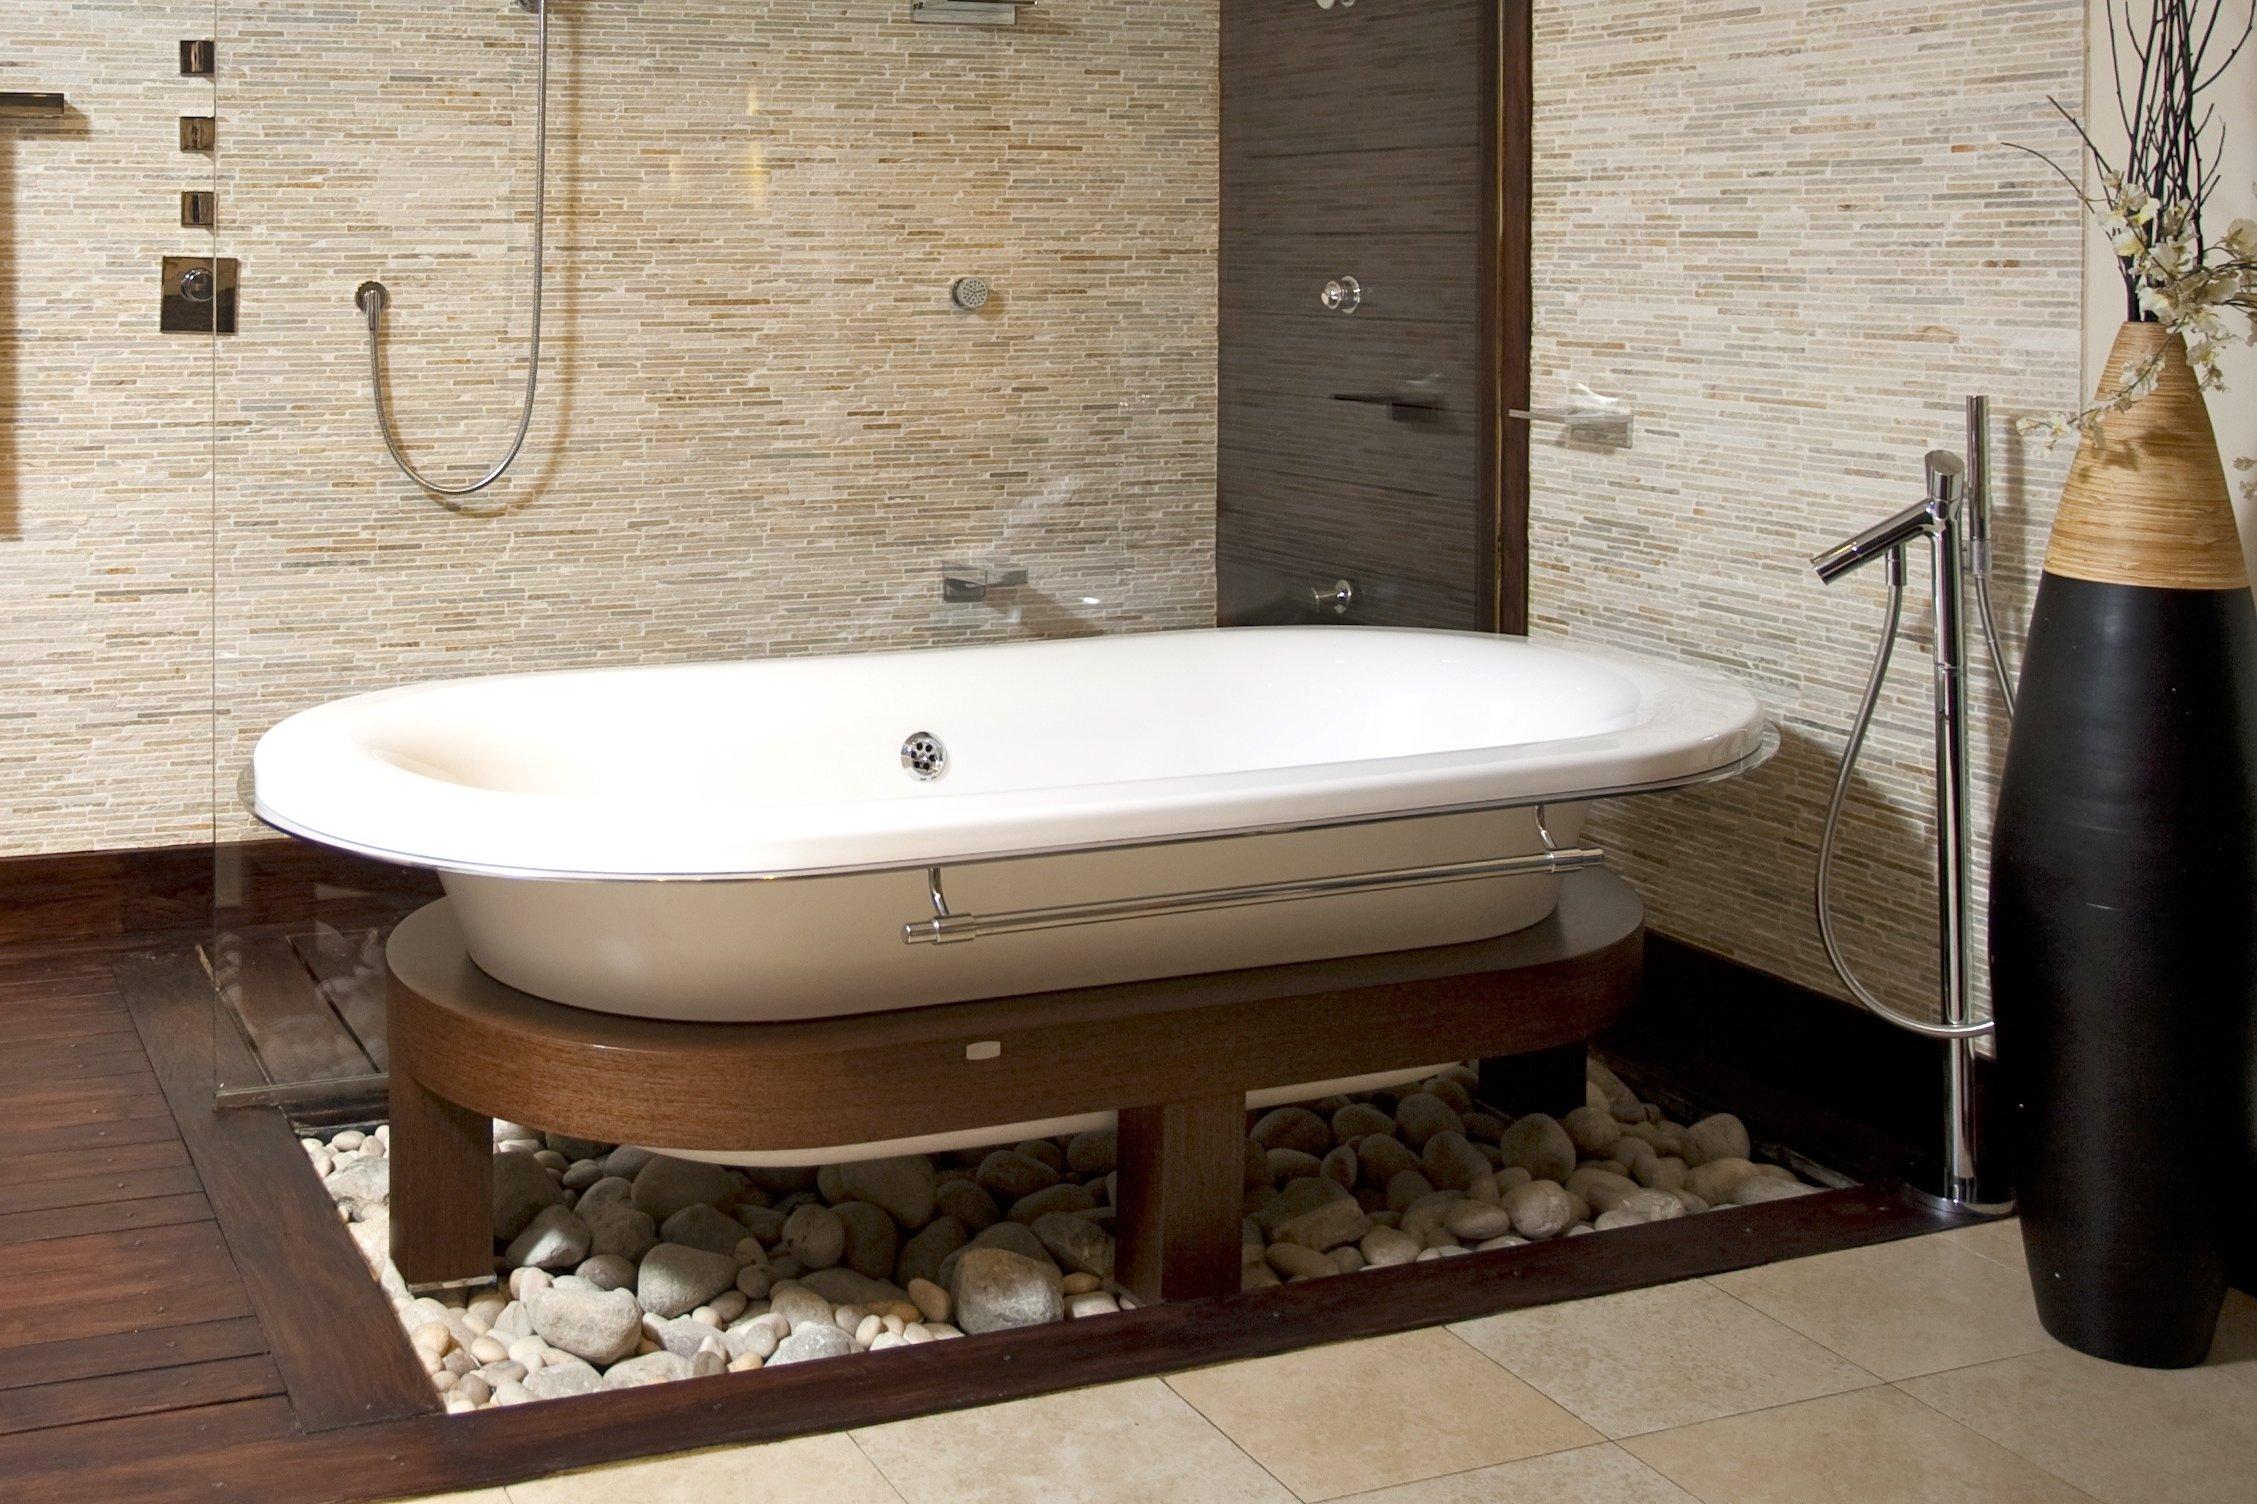 Agencement salles de bains La Roche-Bernard 20